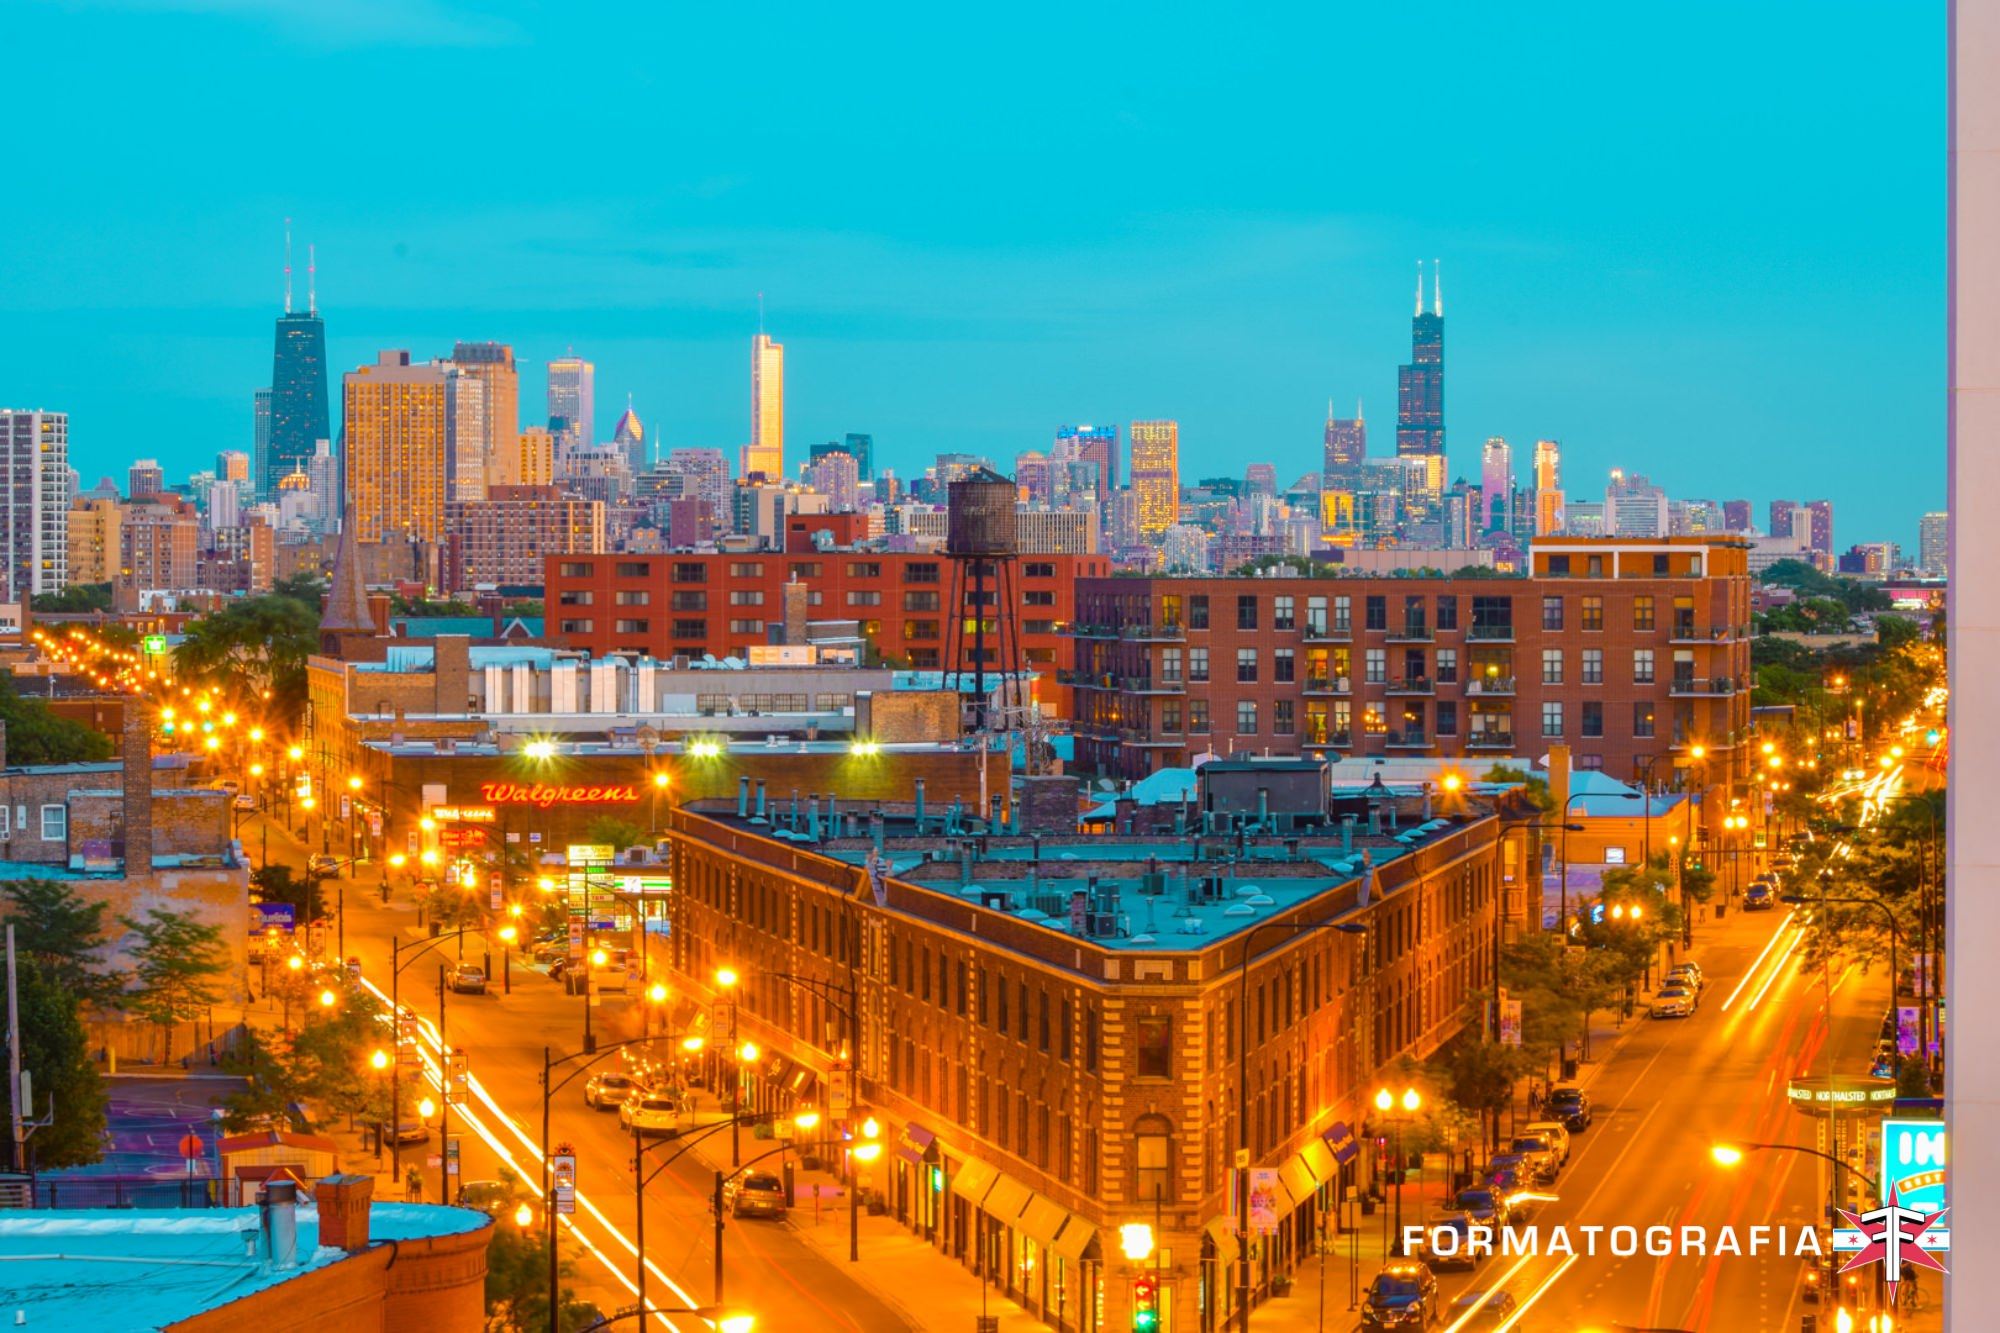 eric formato chicago photographer fall update city architecture shotsDSC_0335-3.jpg